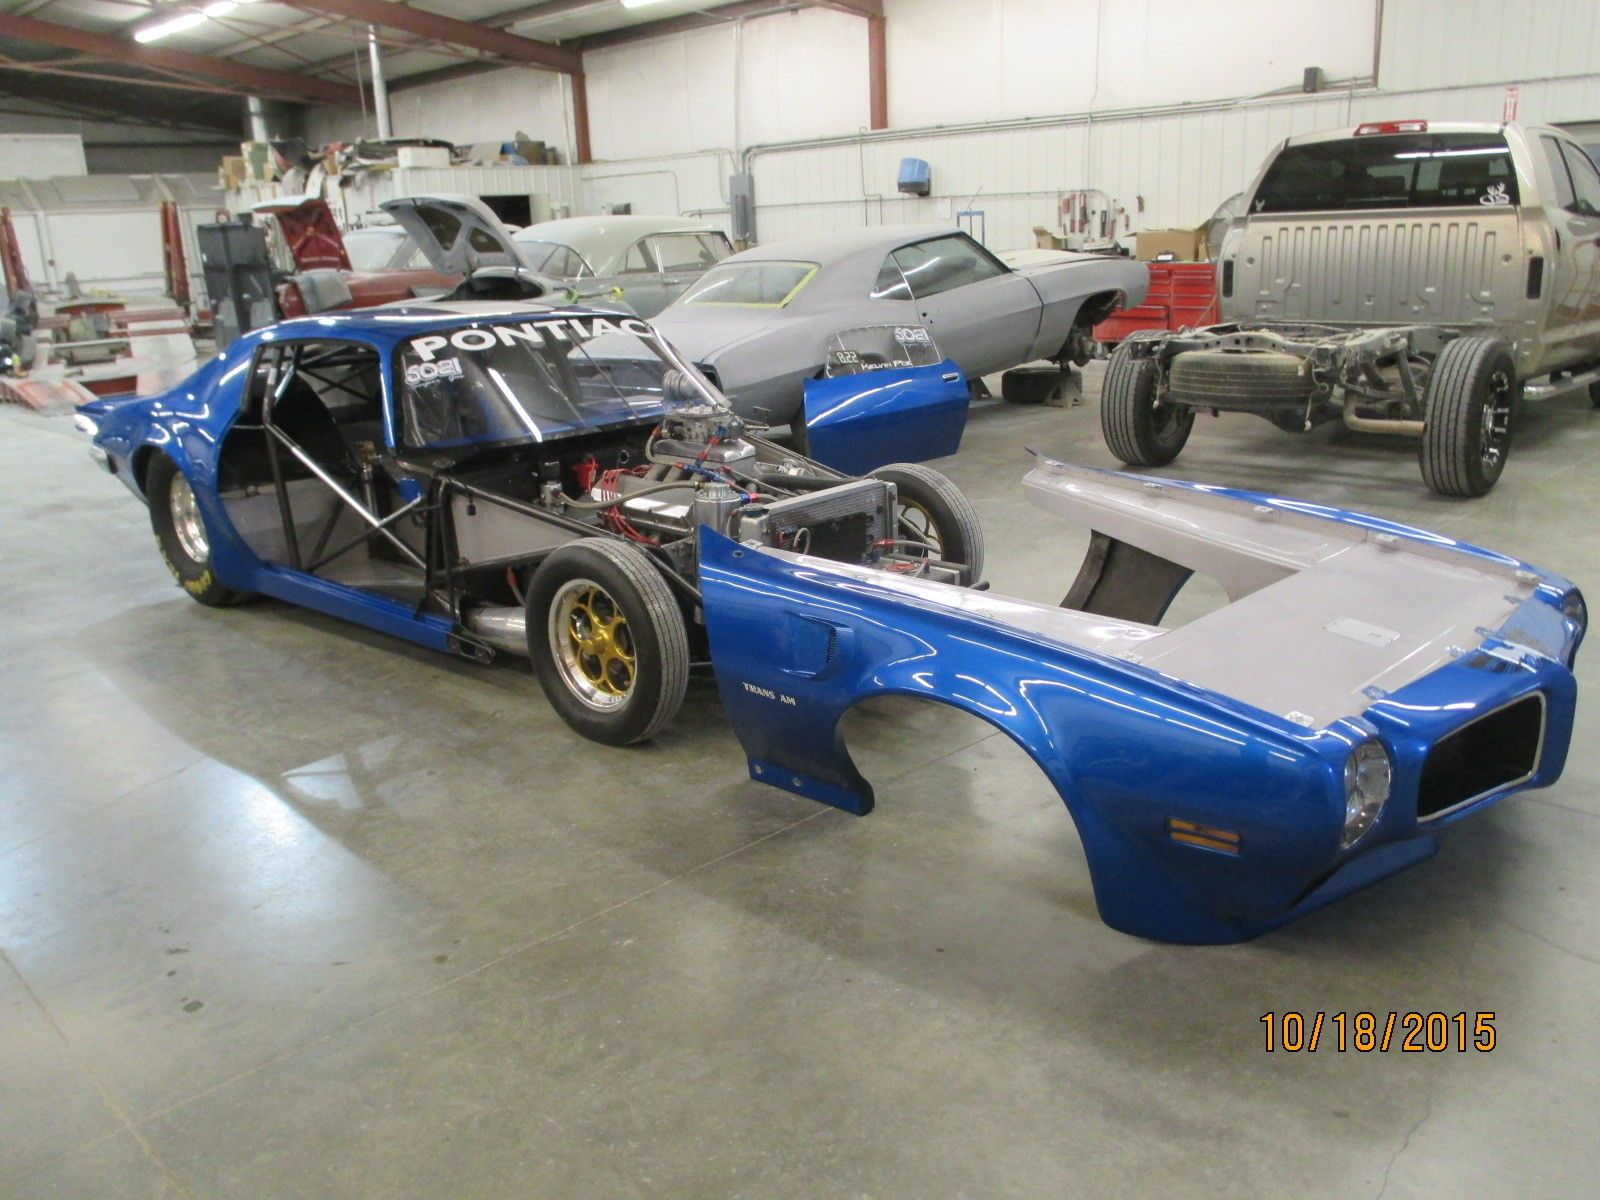 1970 Pontiac Trans Am Tube Chassis Drag Car 21 | Camaro ...